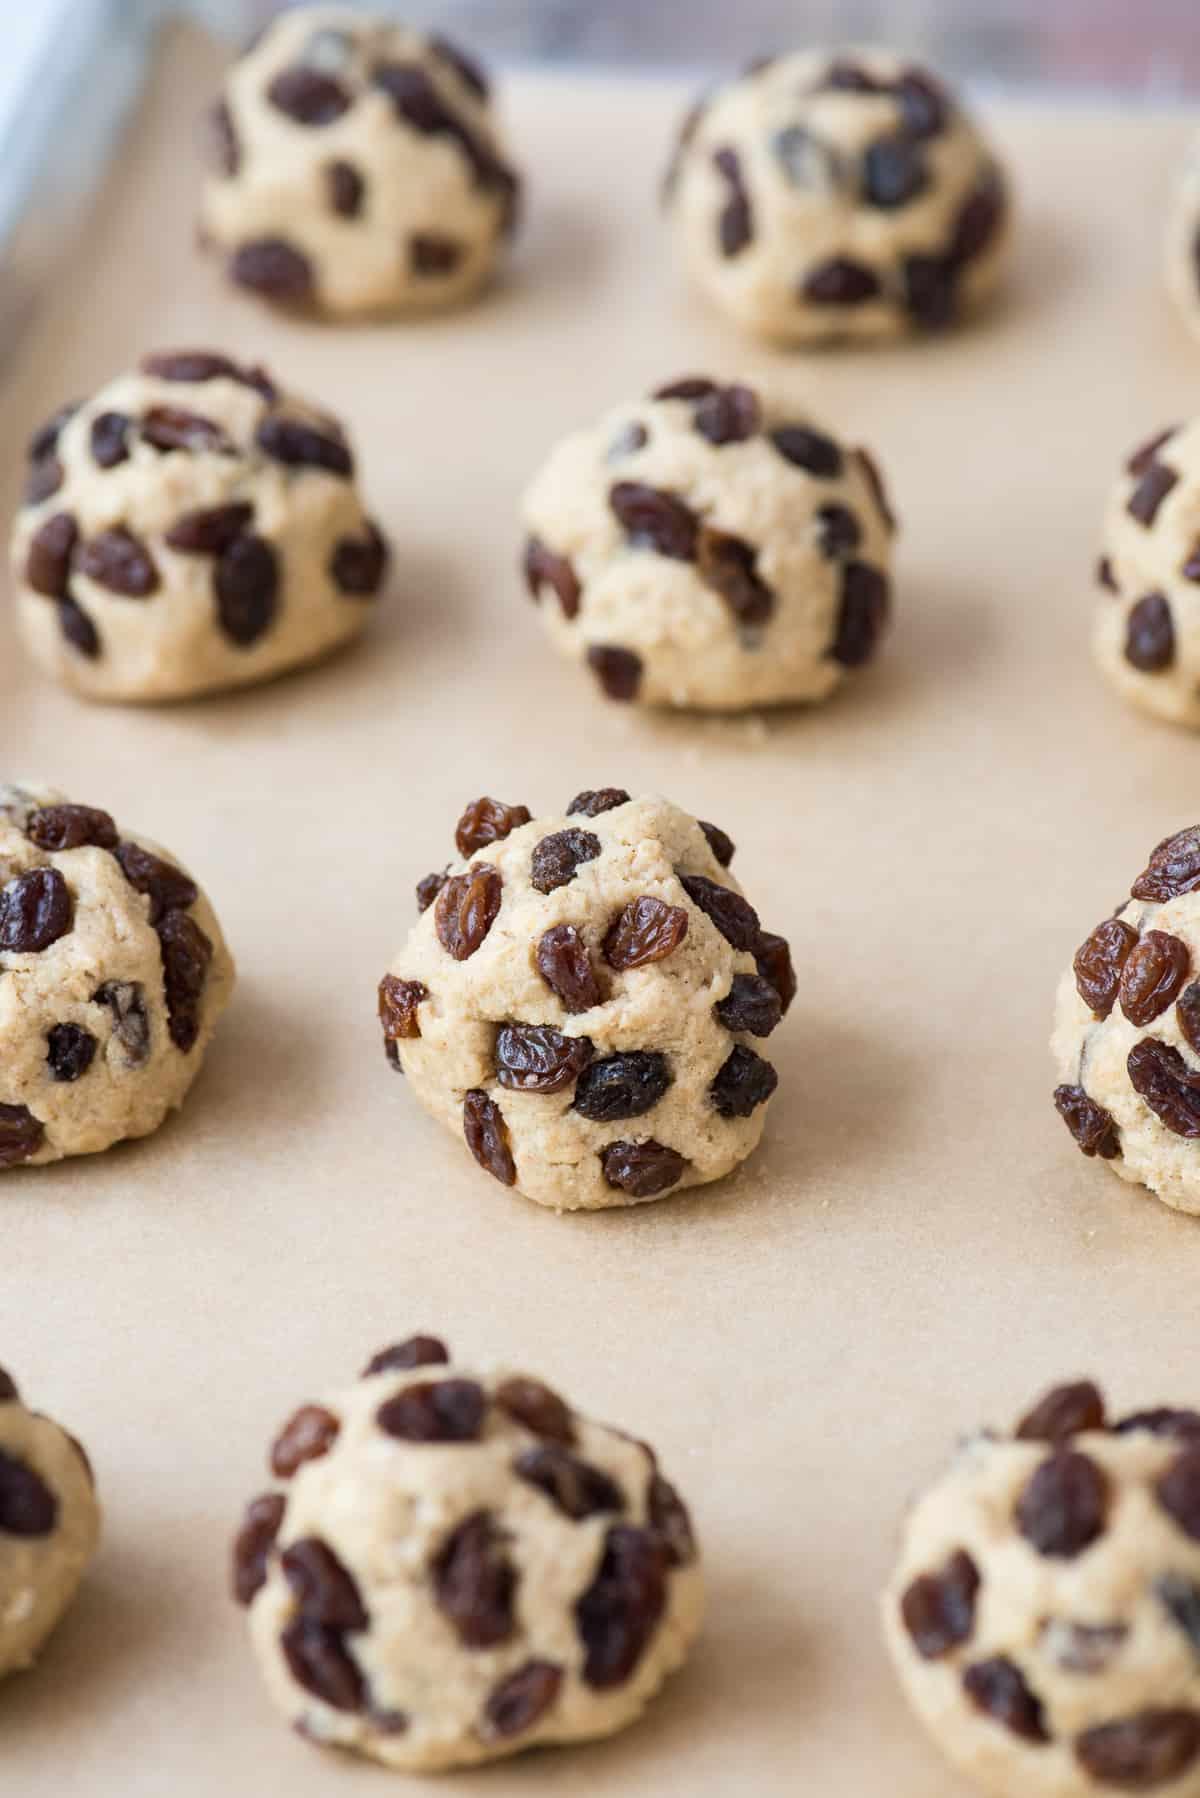 oatmeal raisin cookie dough balls on brown parchment paper